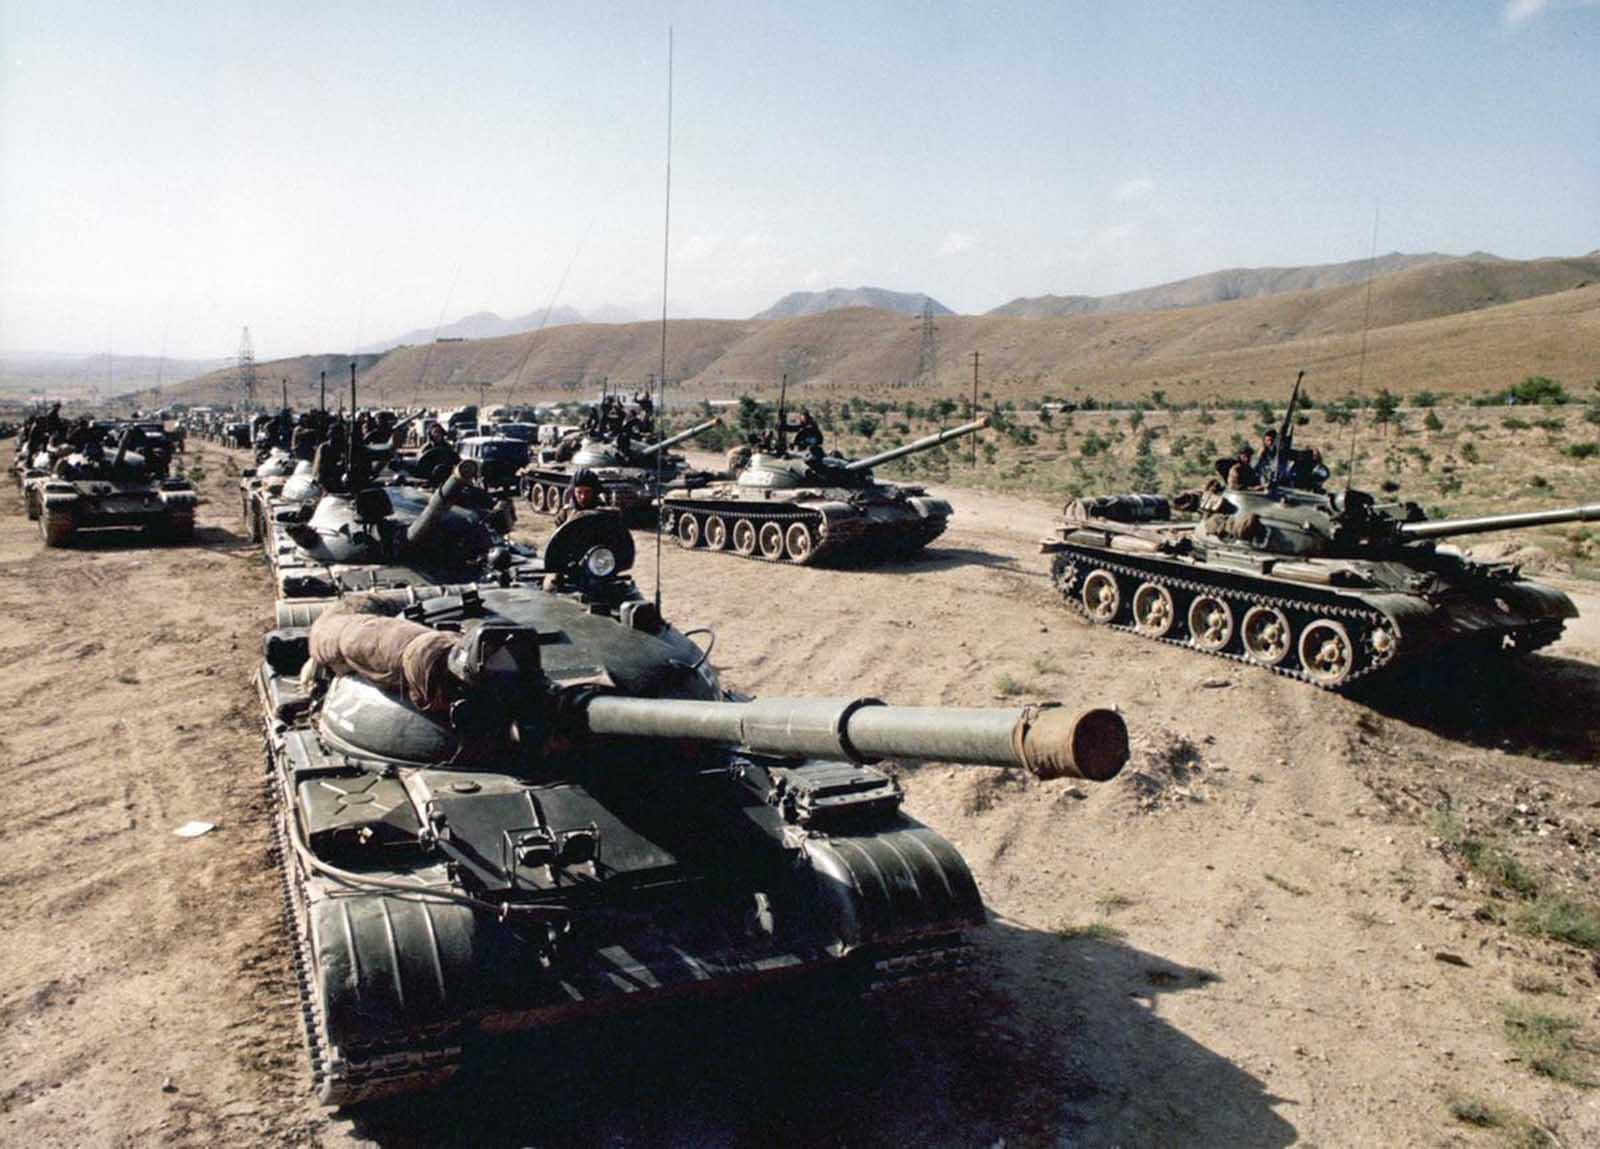 les blindés Soviet_war_in_afghanistan_in_pictures-10-jpg